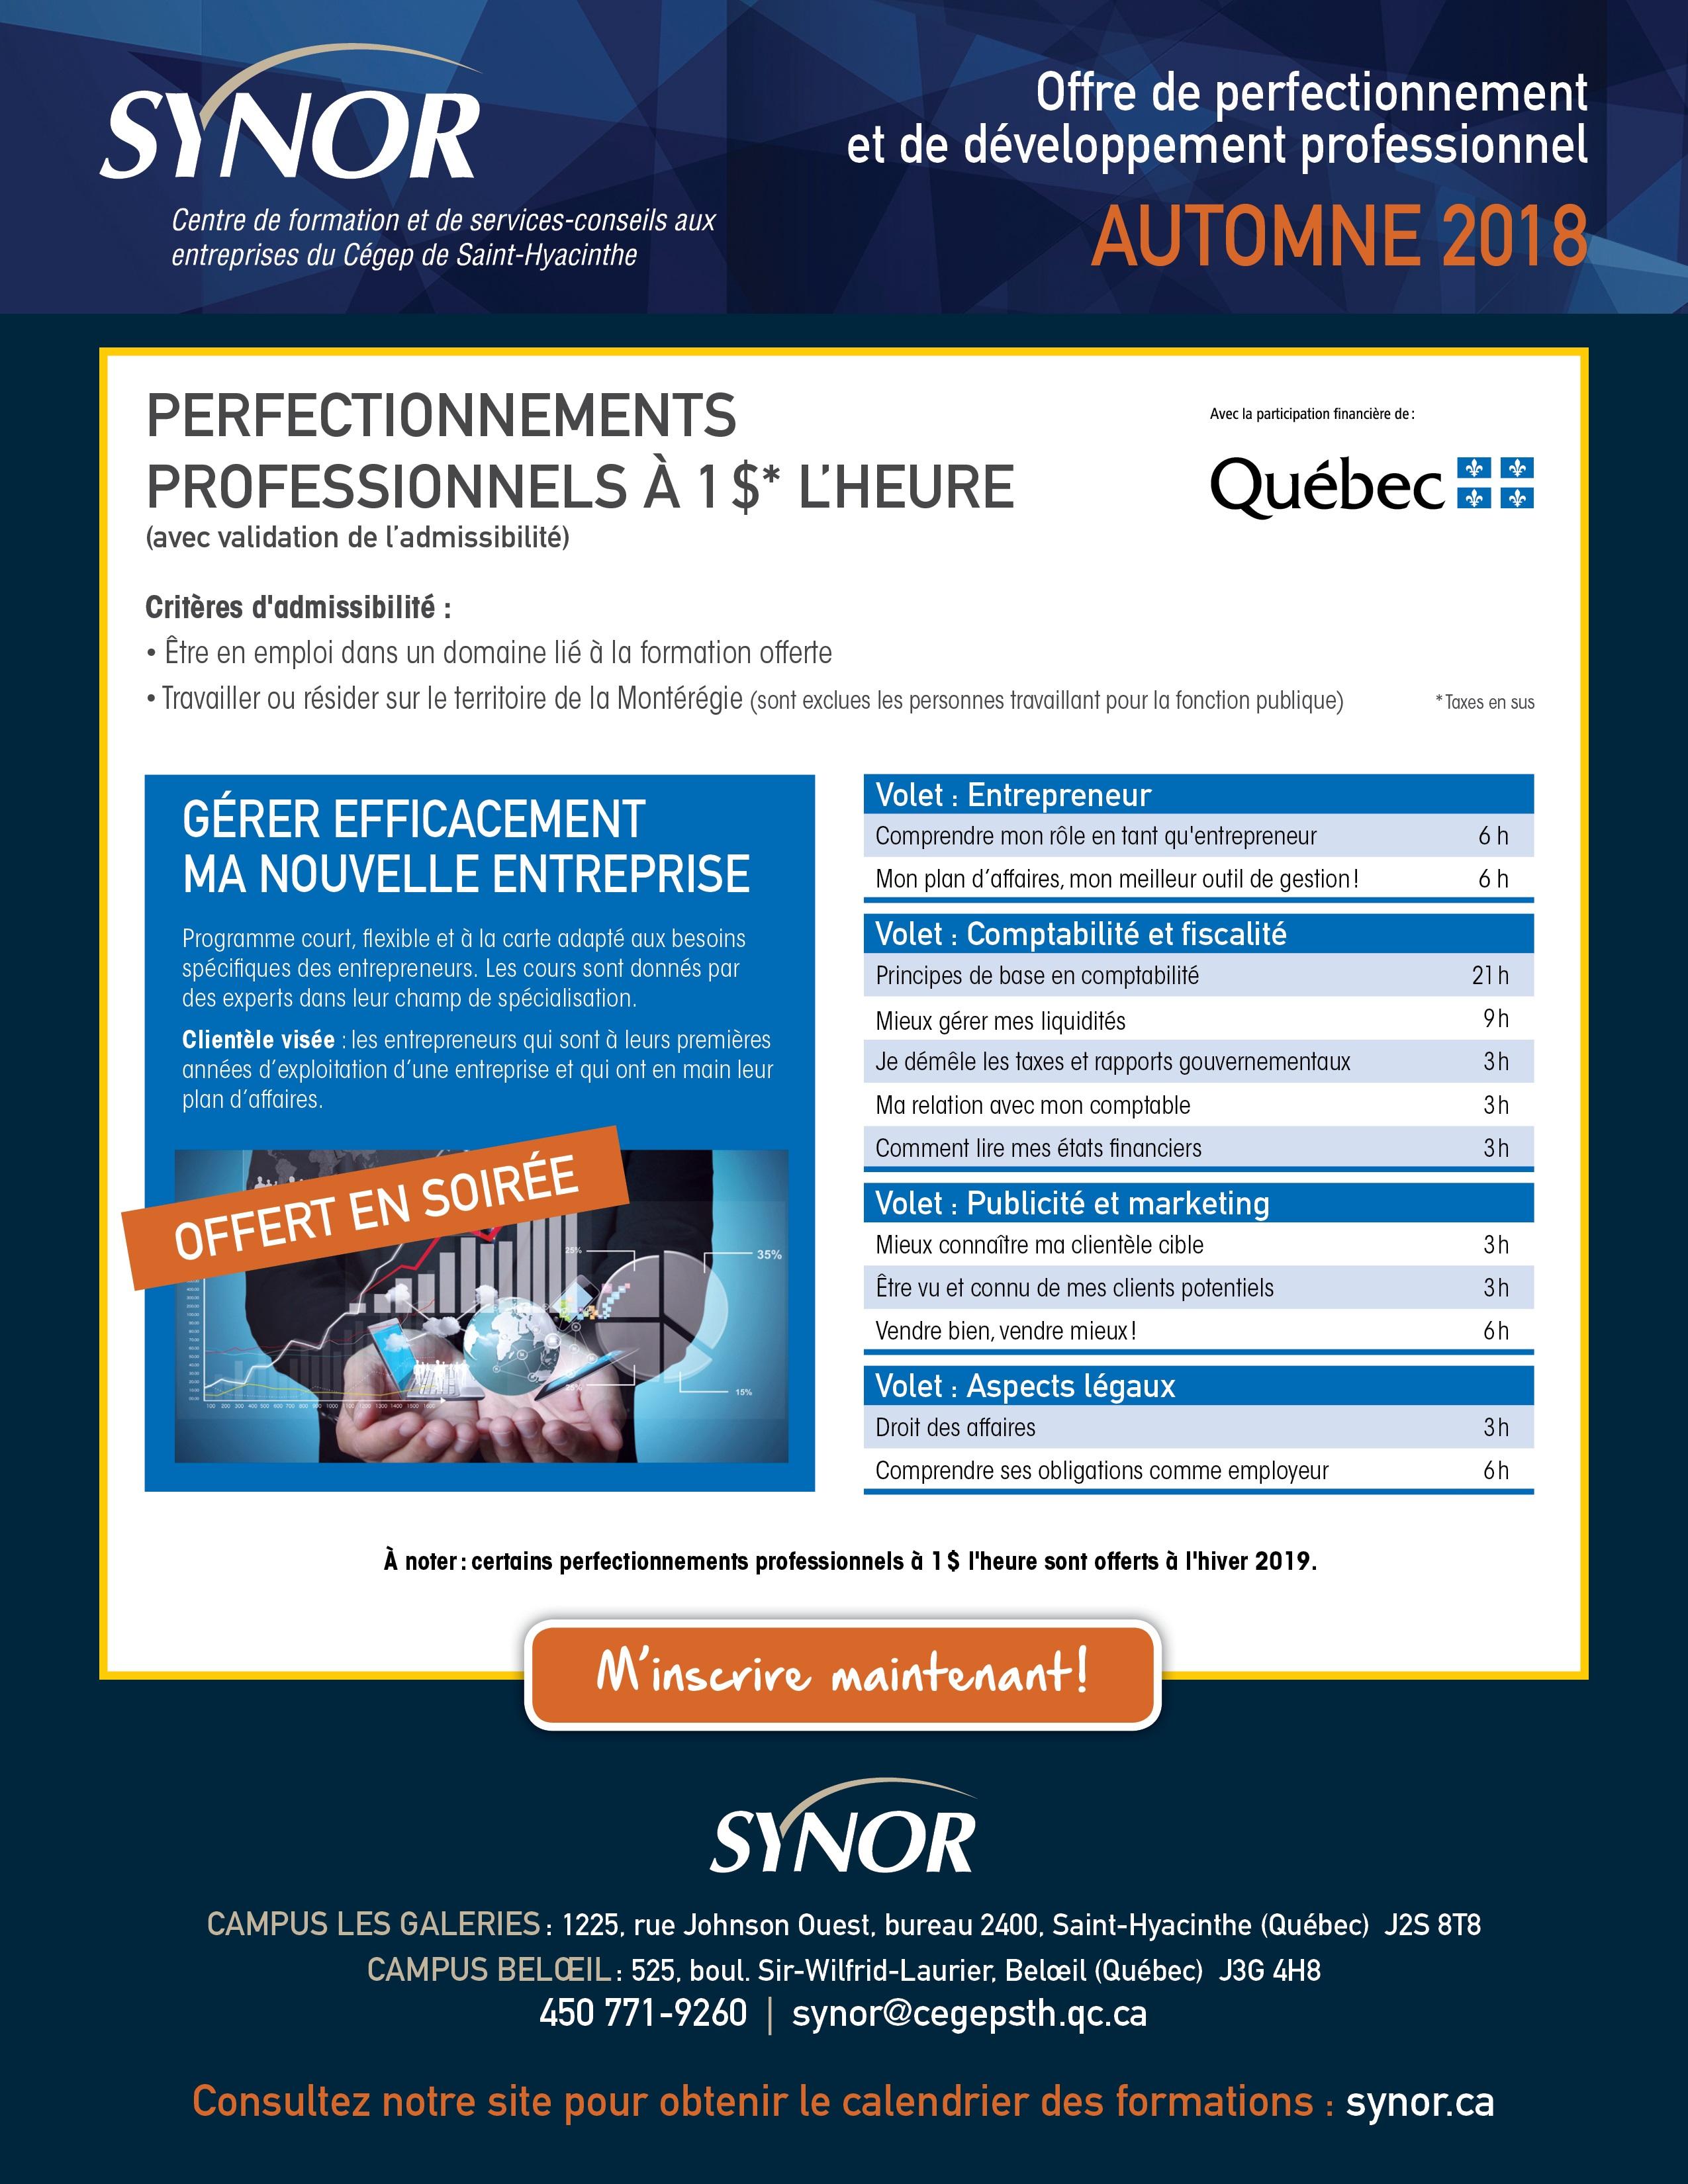 OffreCoursA18 - SYNOR-perfectionnement-entreprise